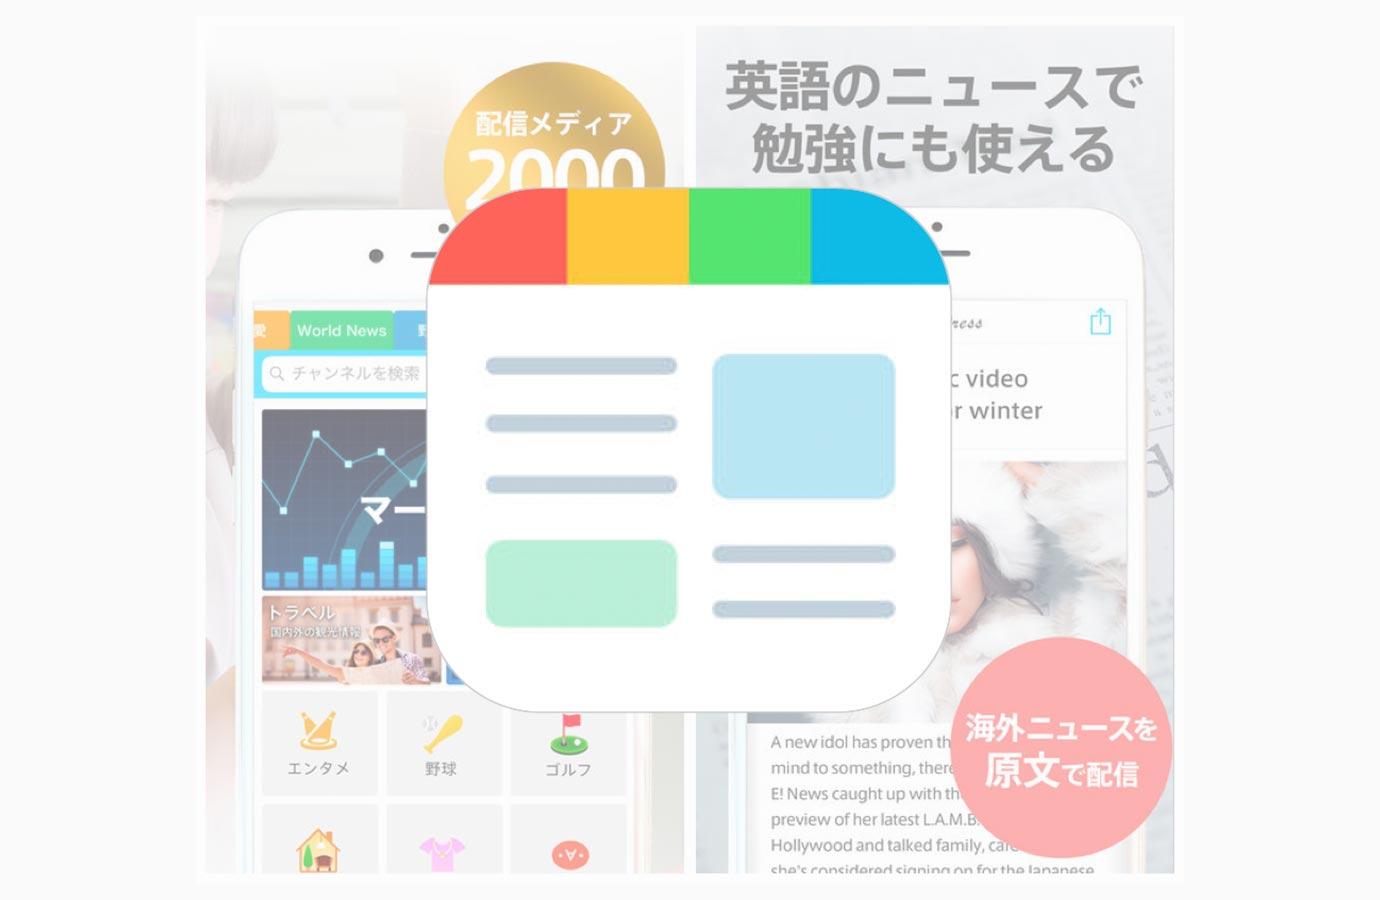 SmartNews、iOSアプリ「スマートニュース 5.0.9」リリース ― 主要なチャンネルのアイコン表示を改善など